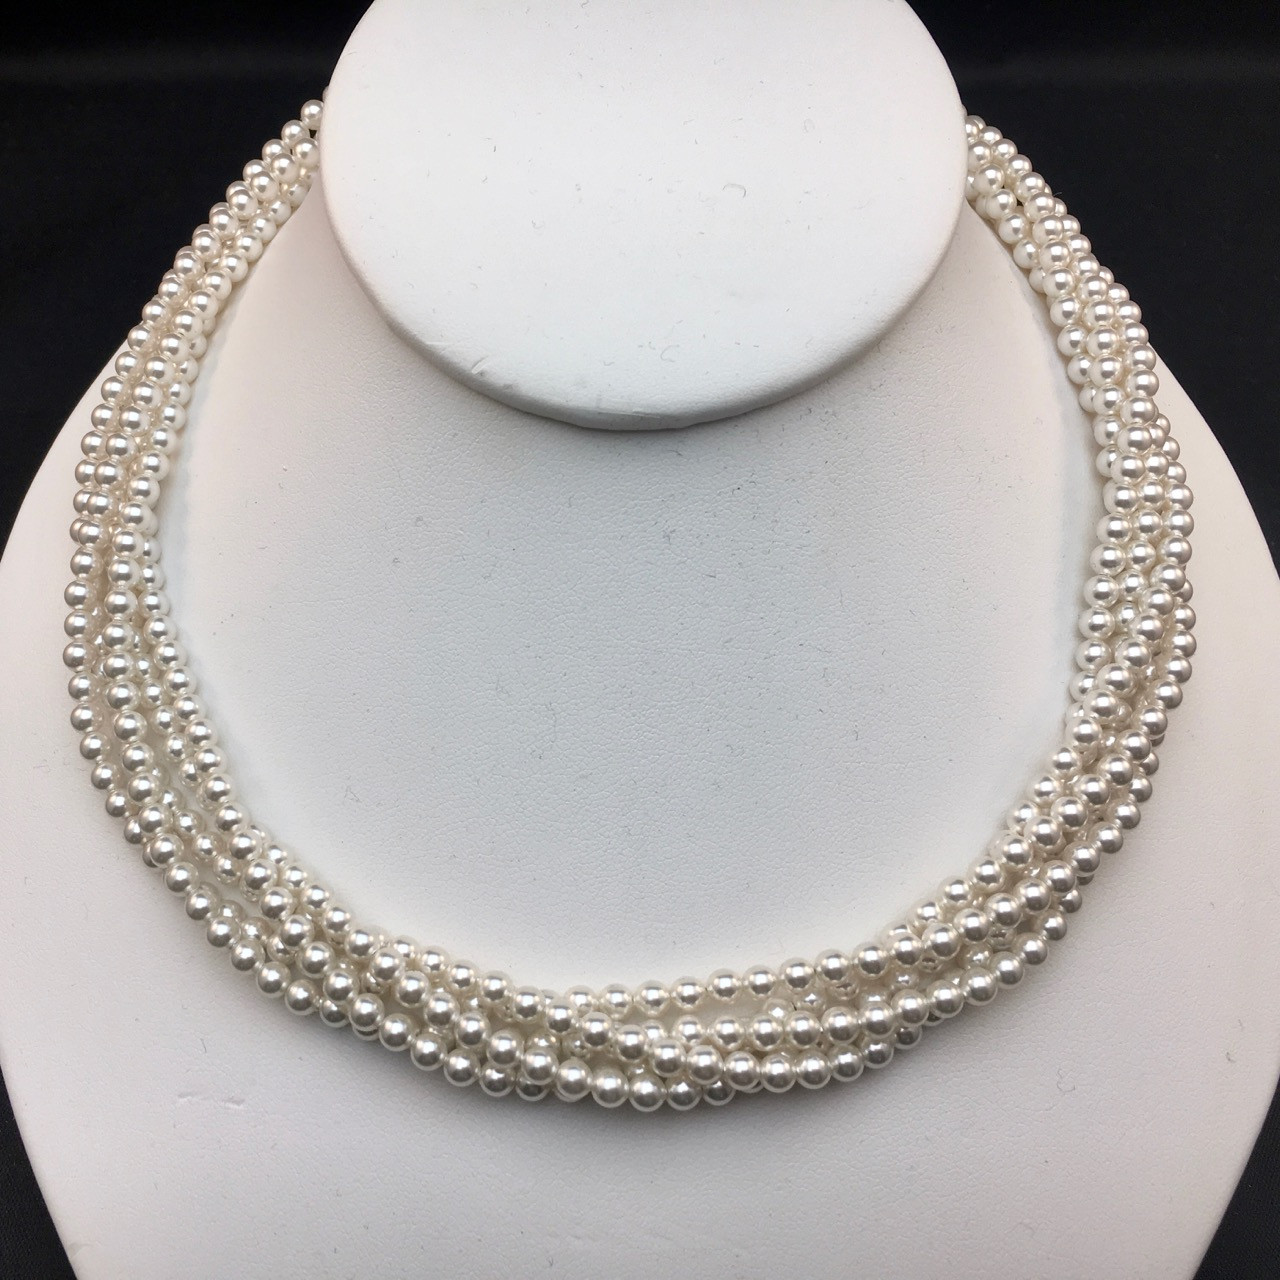 1244fd87cf567d Swarovski 5-strand pearl necklace - SMH Jewelry